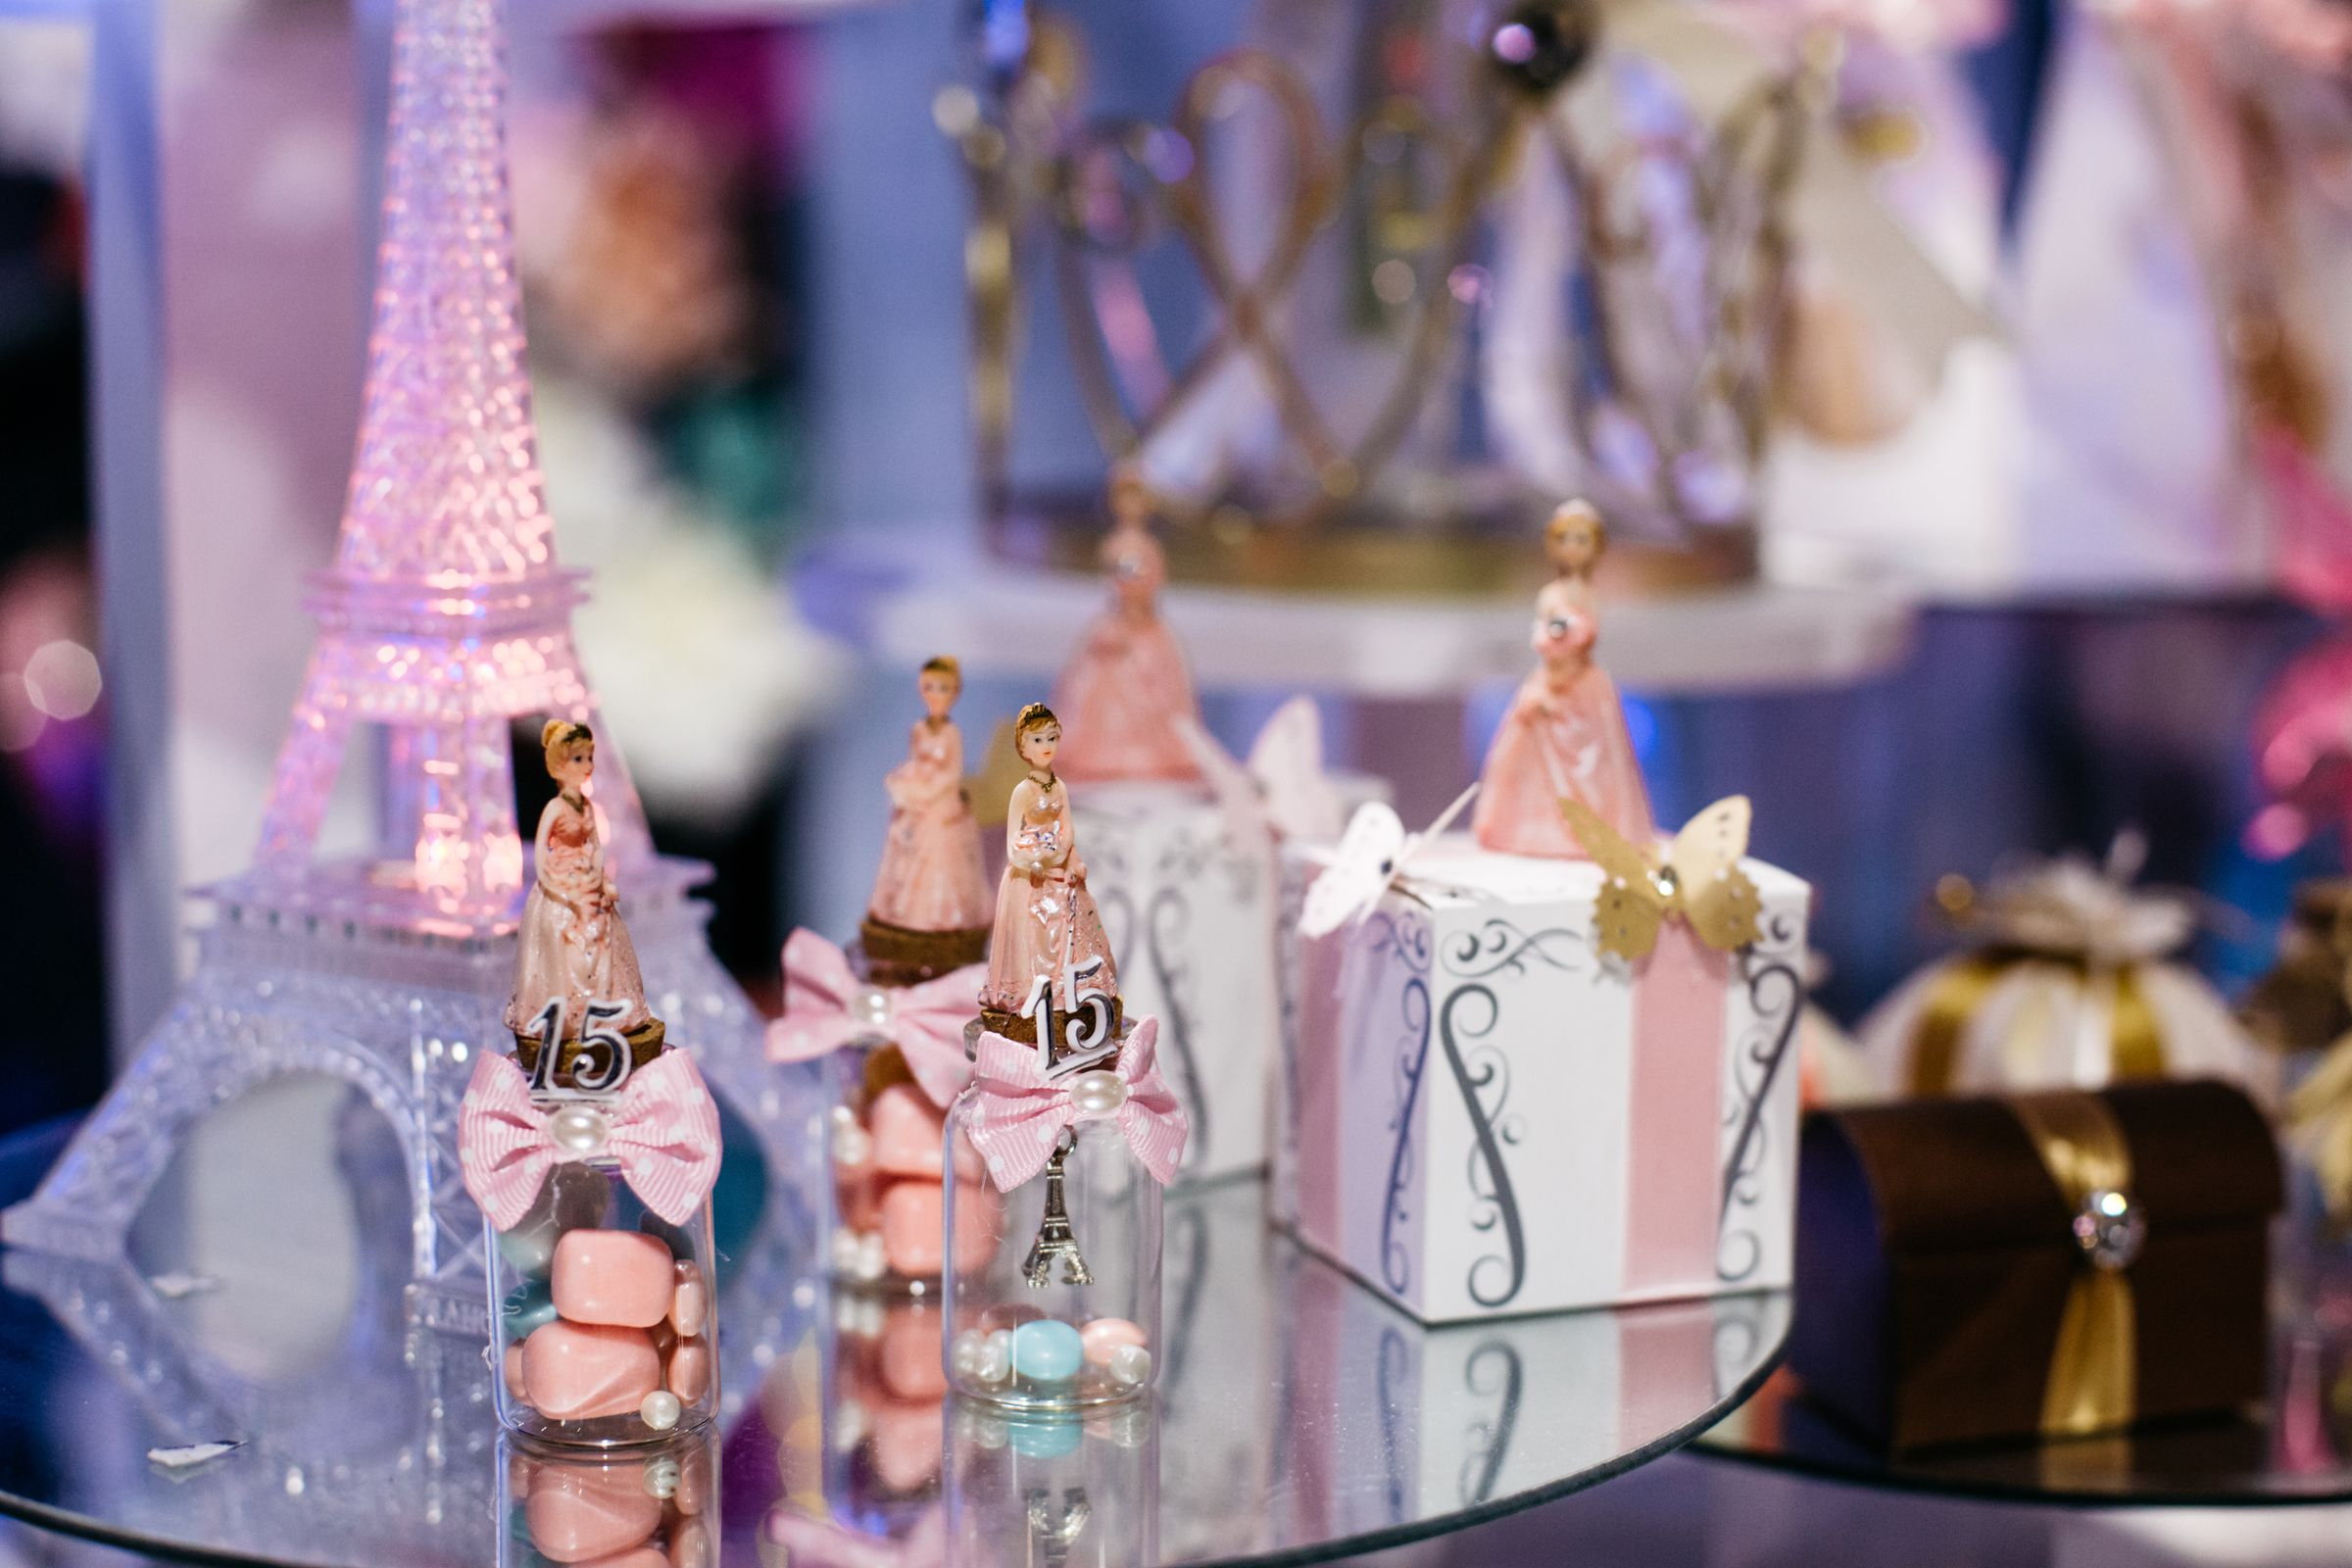 Photo courtesy of racked.com (Jessica Pons)